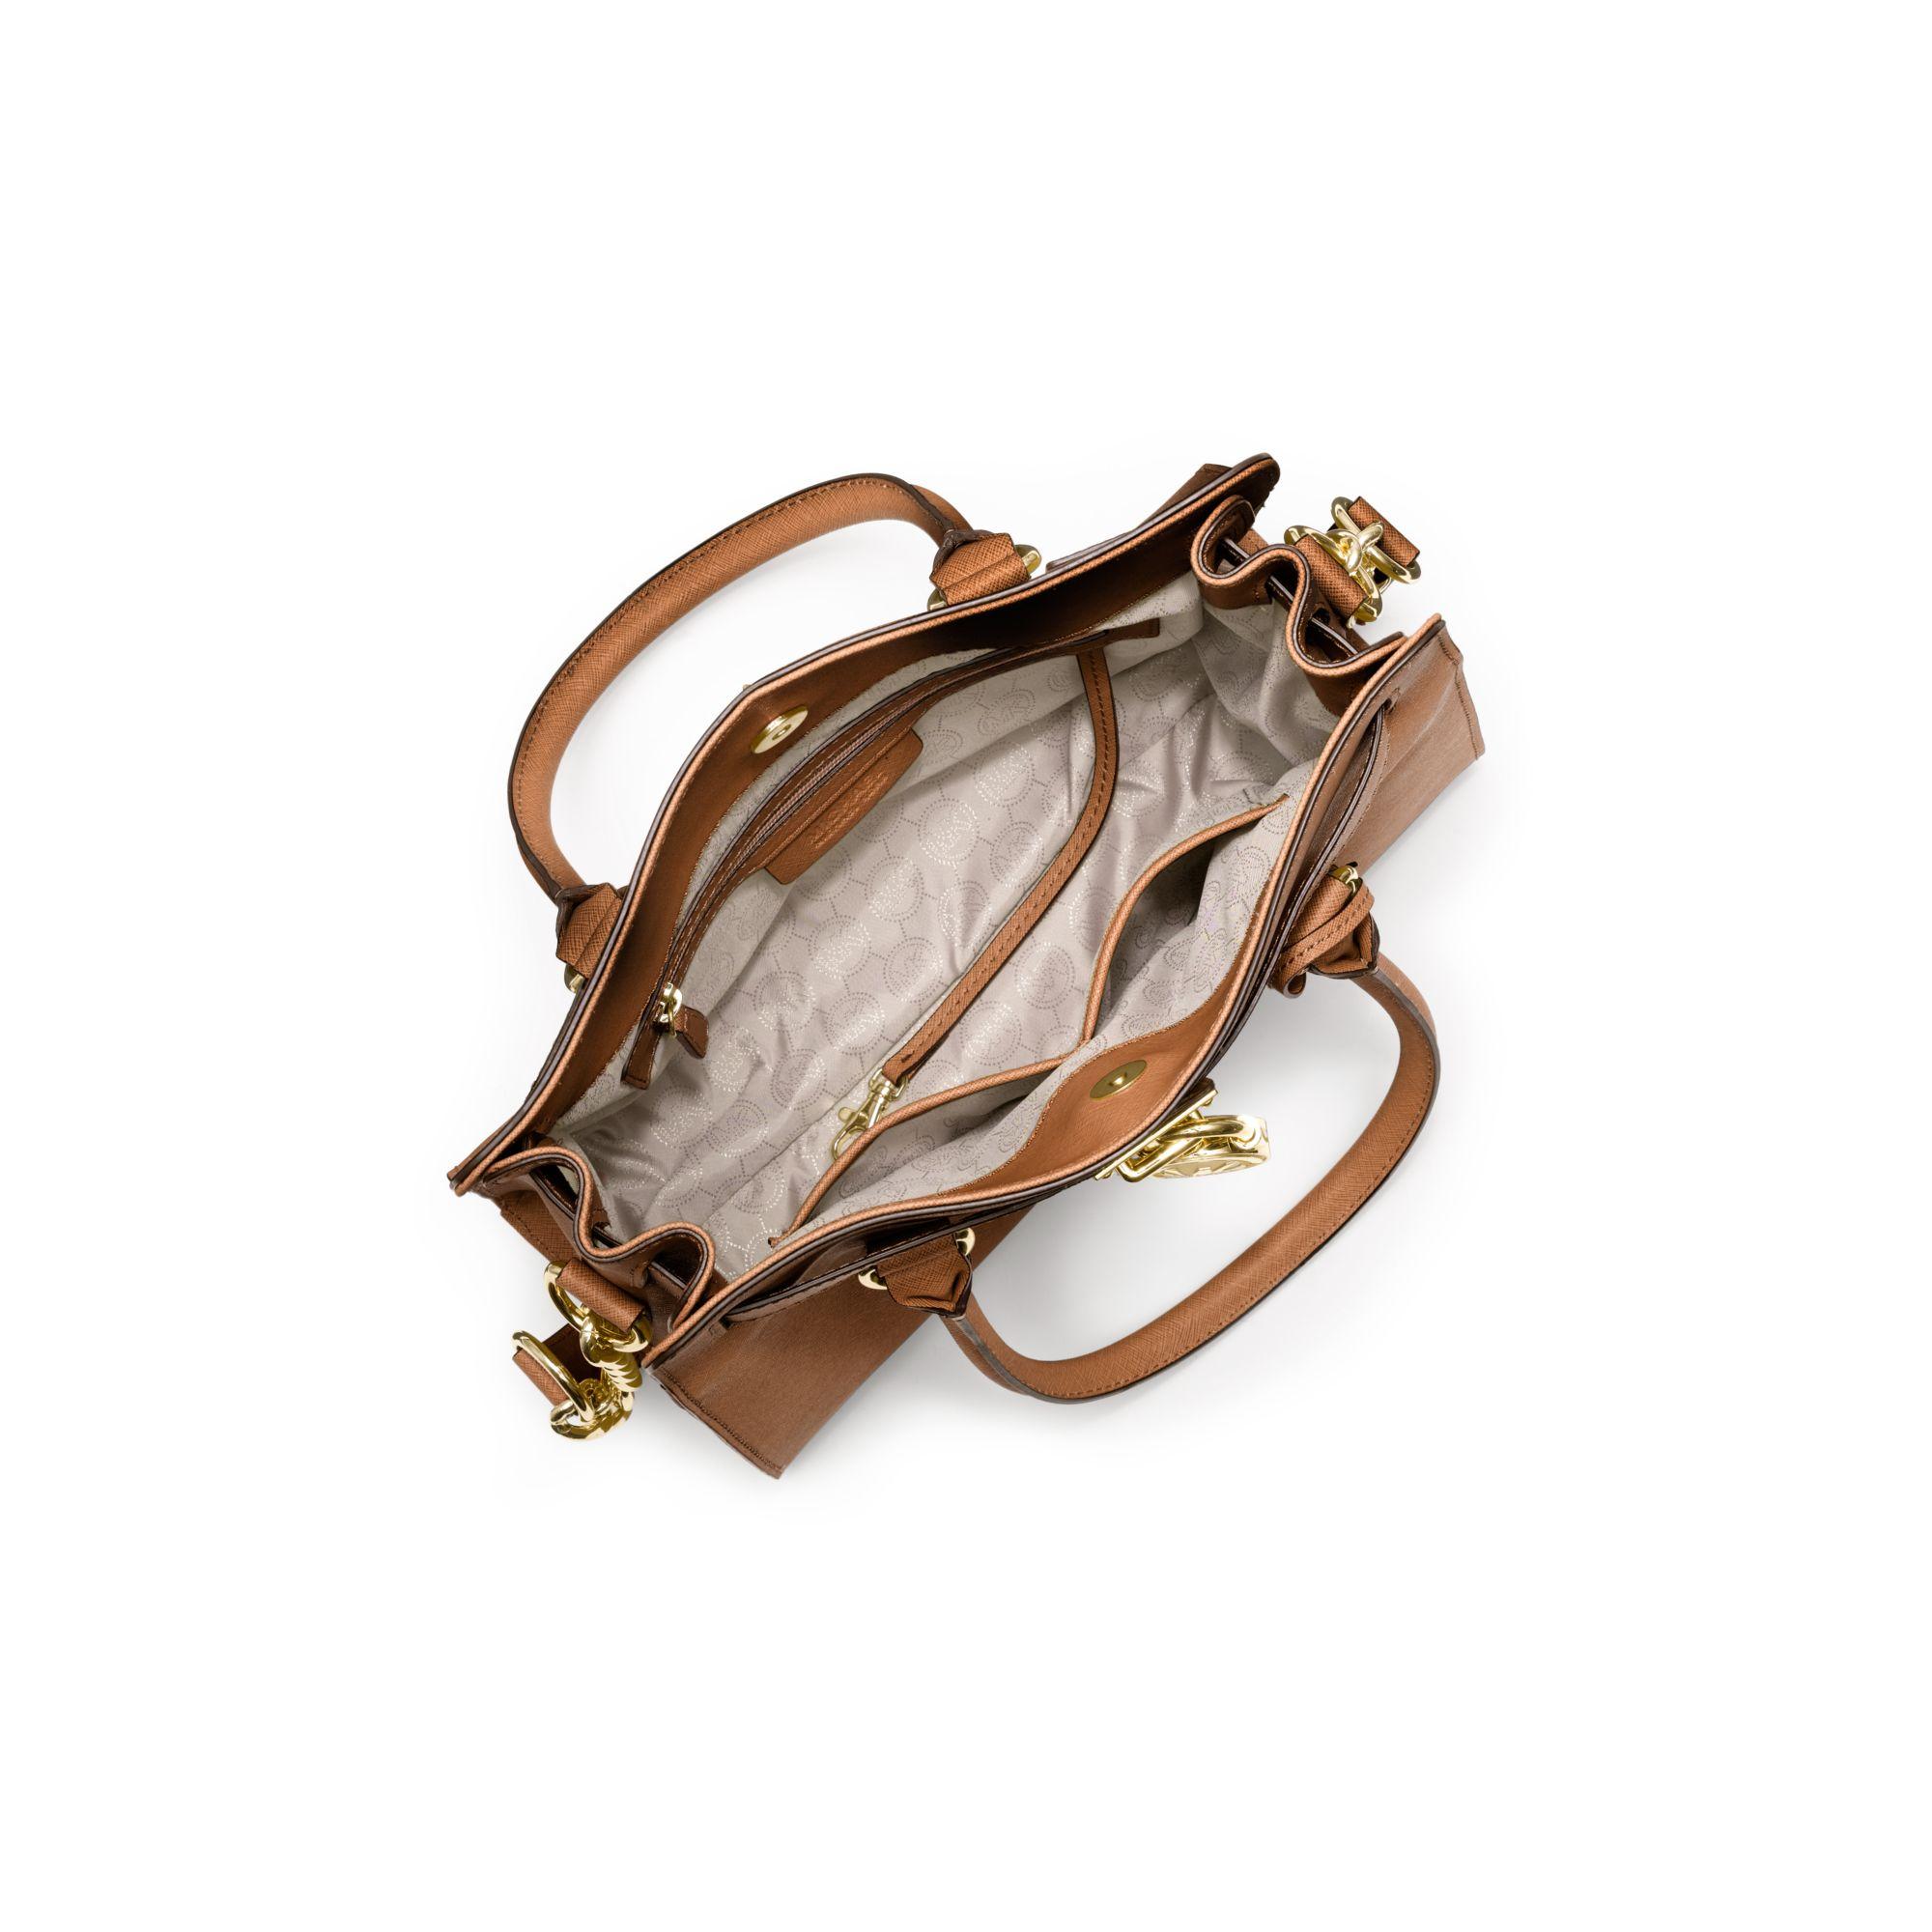 8268575566df Michael Kors Hamilton Saffiano Leather Medium Satchel in Brown - Lyst